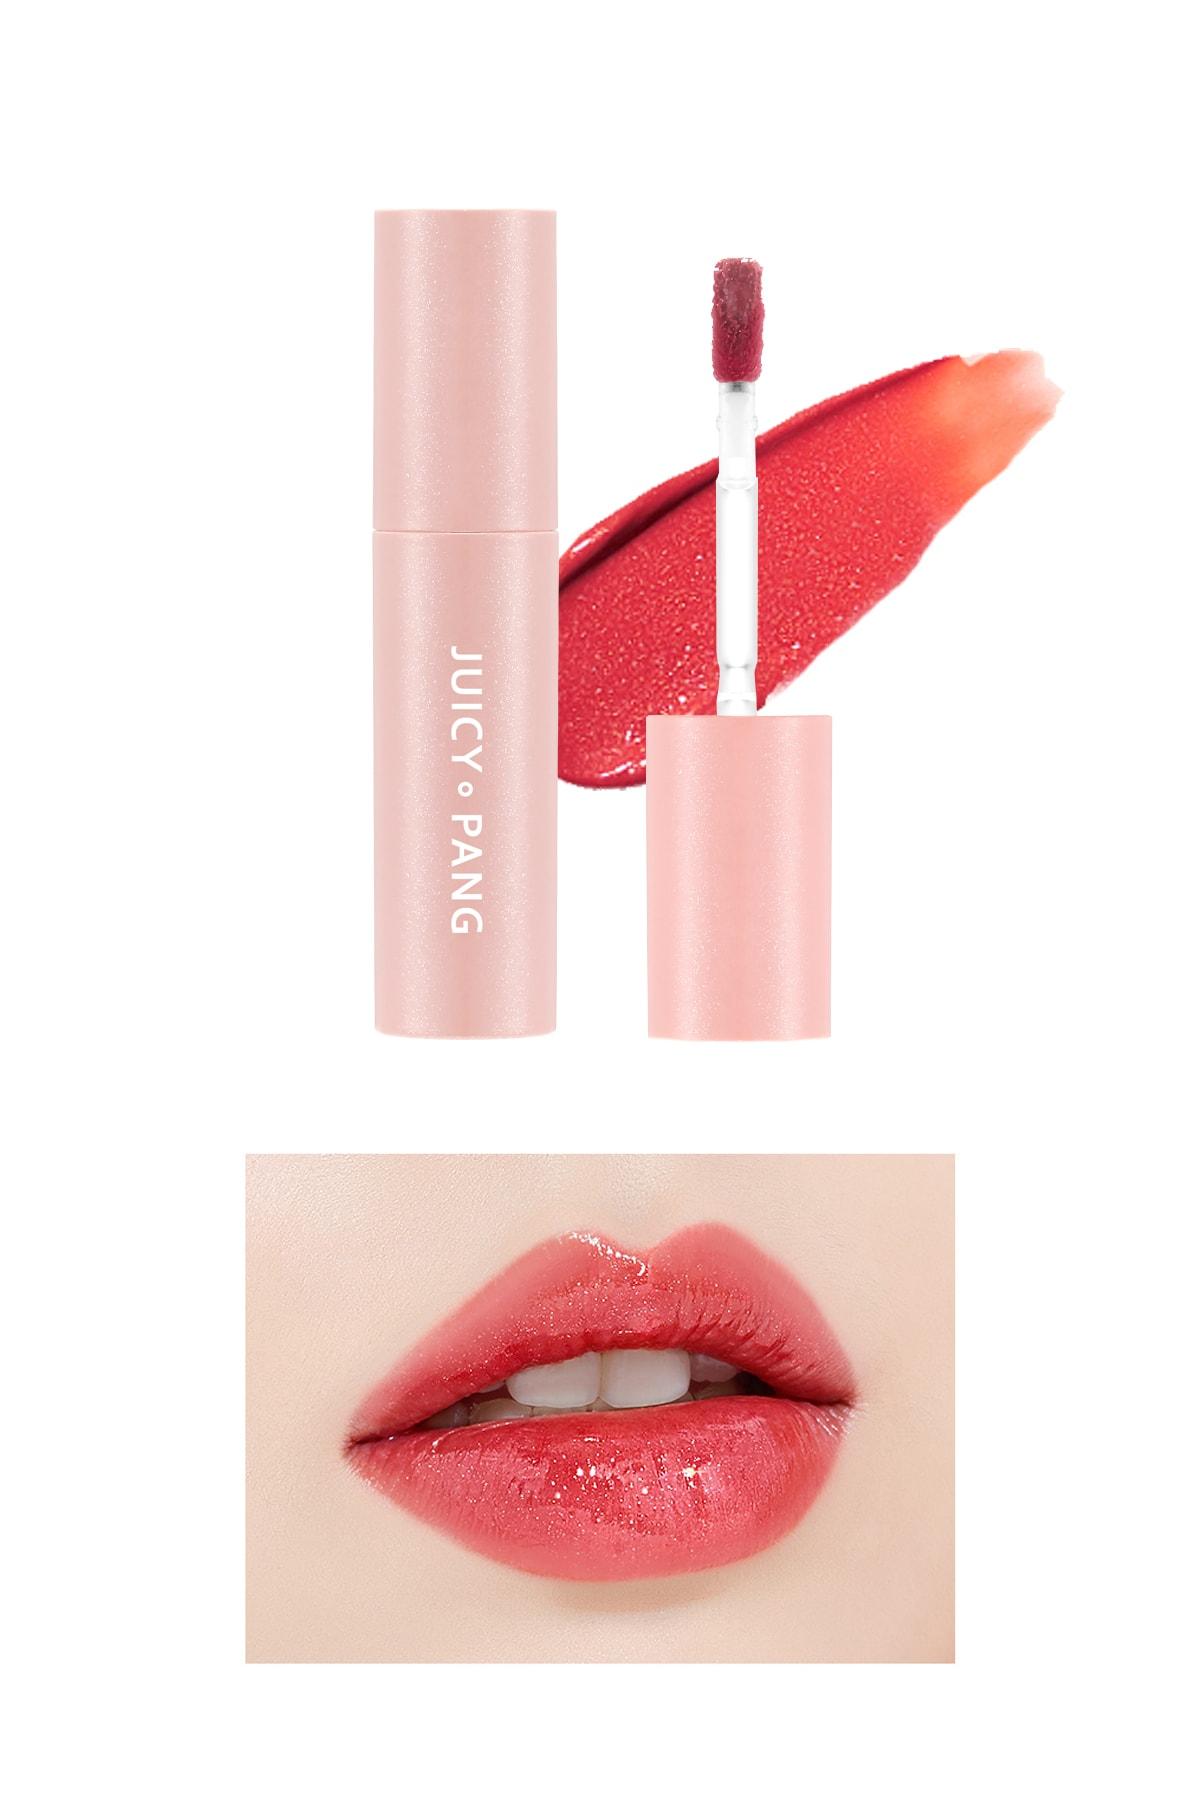 Missha Işıltı&Dolgunluk Veren Parlak Gloss Tint APIEU Juicy-Pang Sparkling Tint BE02 0